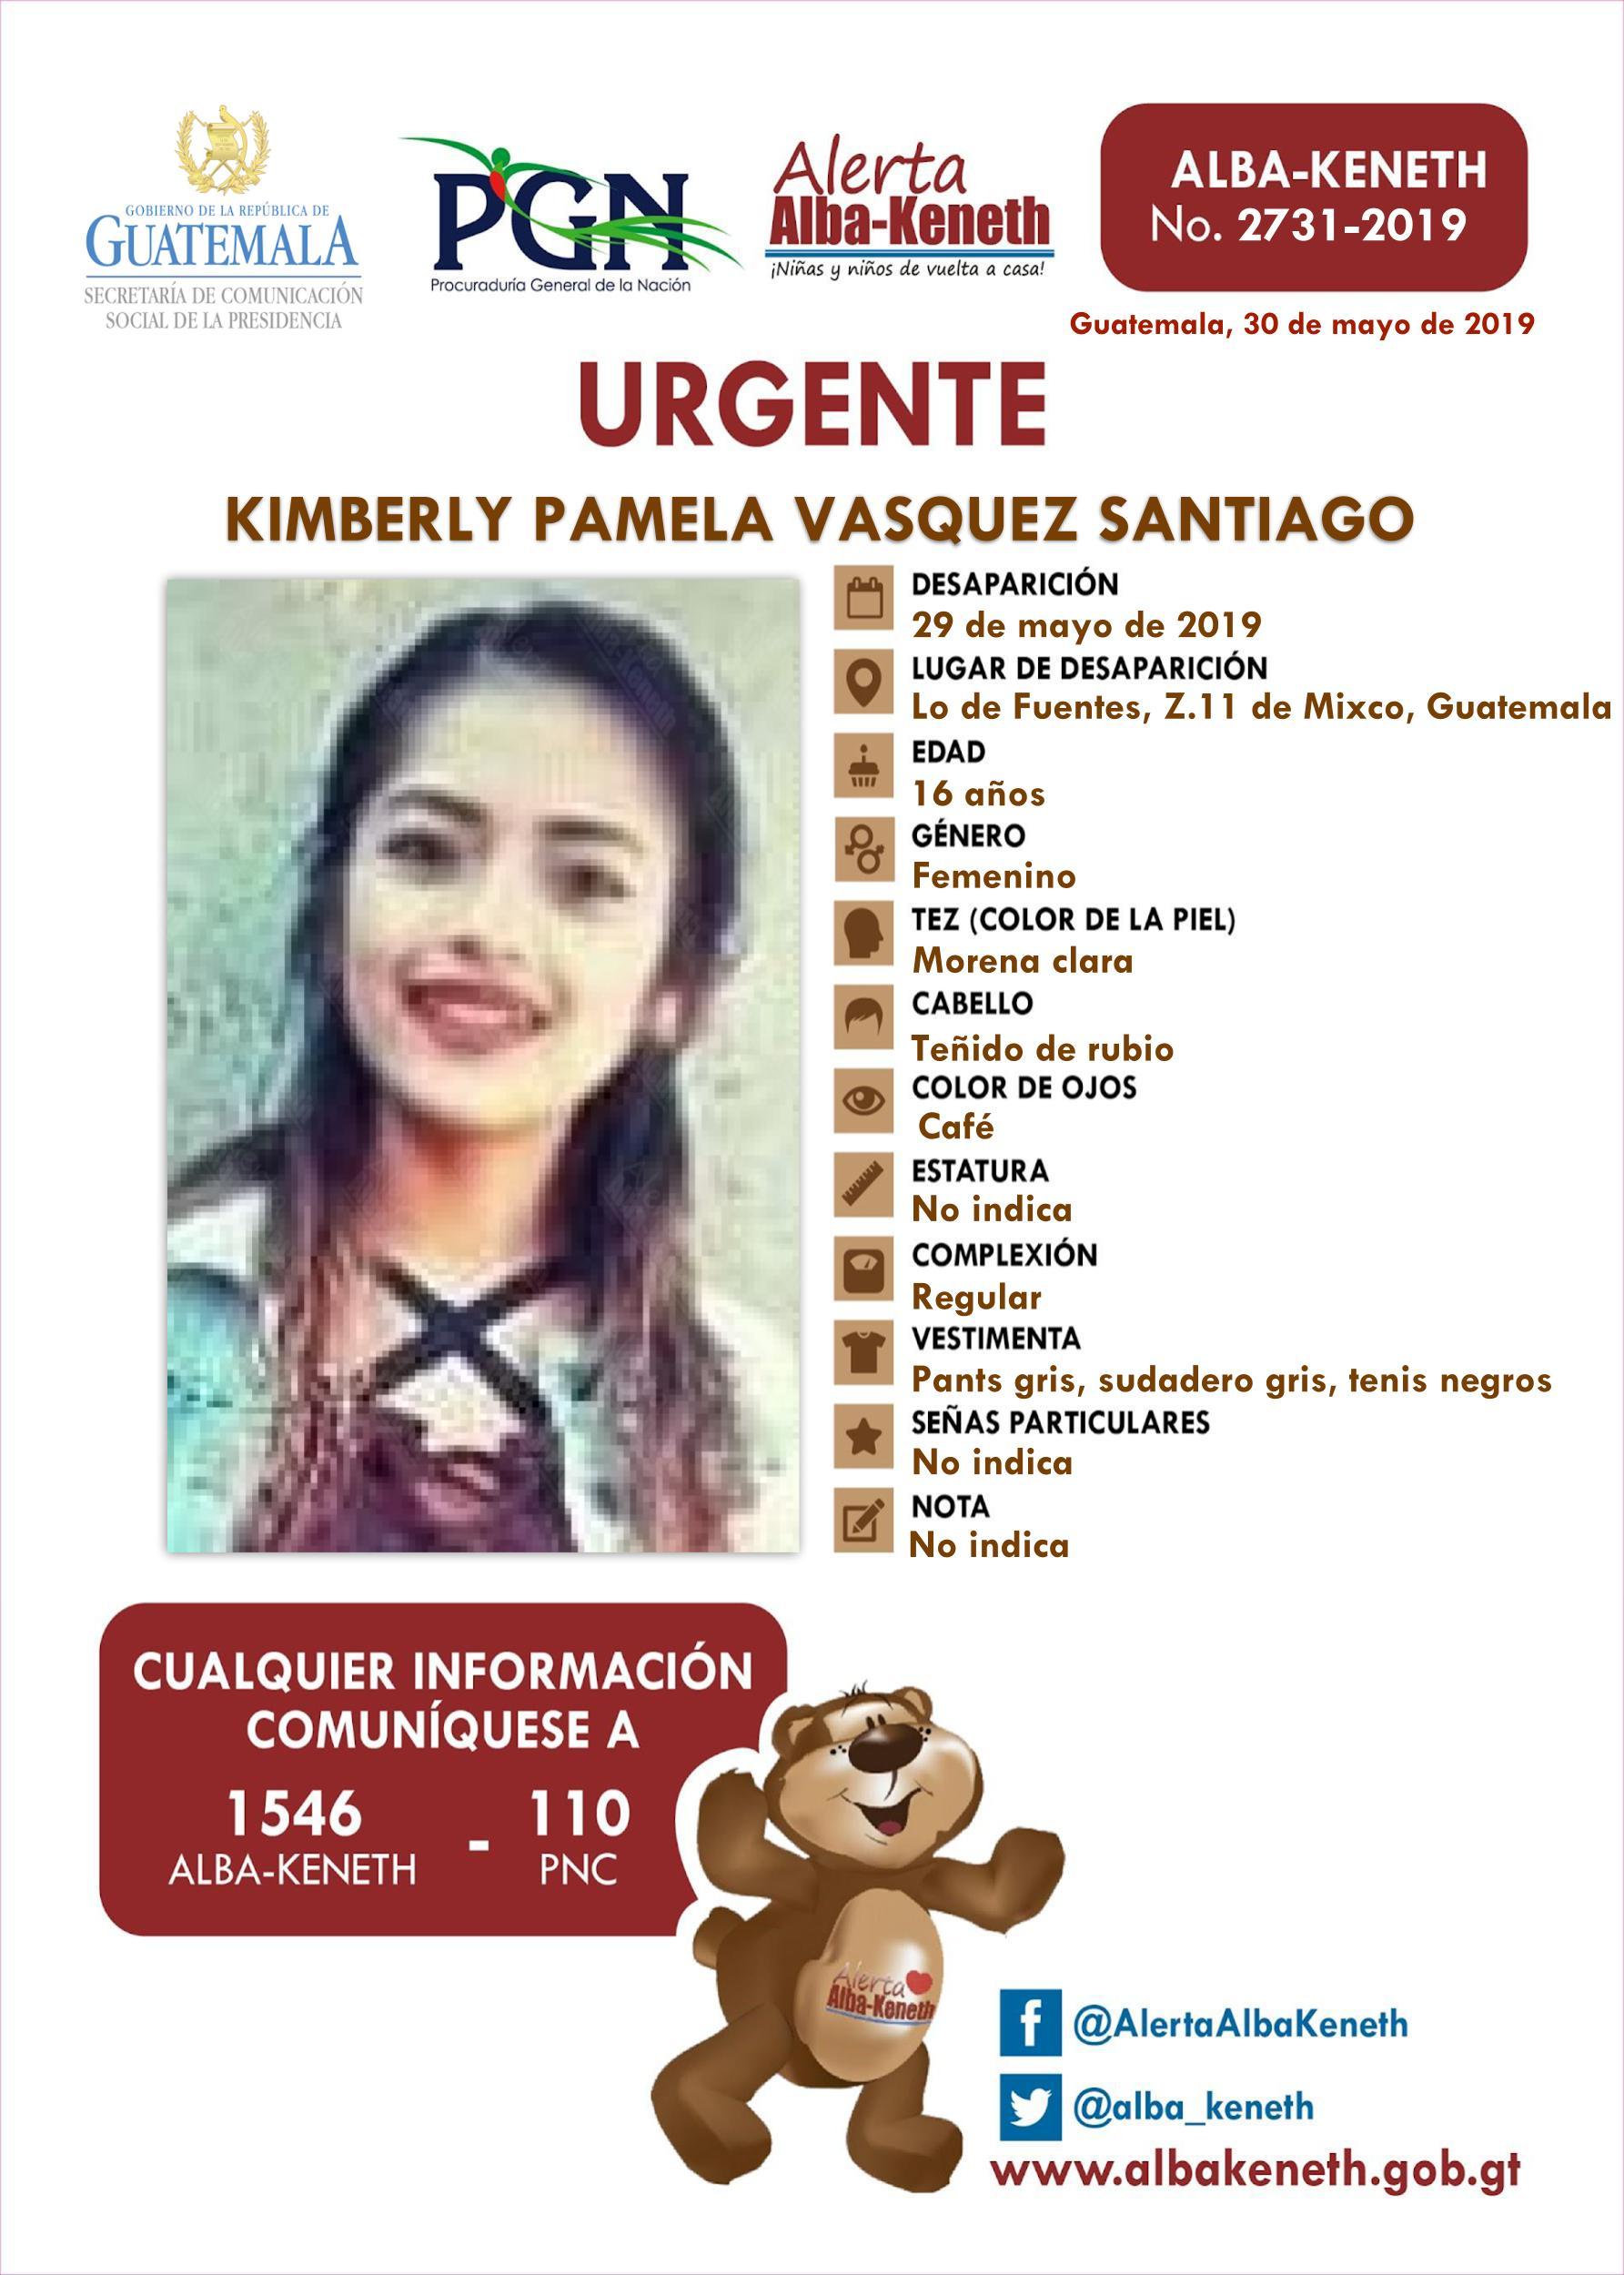 Kimberly Pamela Vasquez Santiago